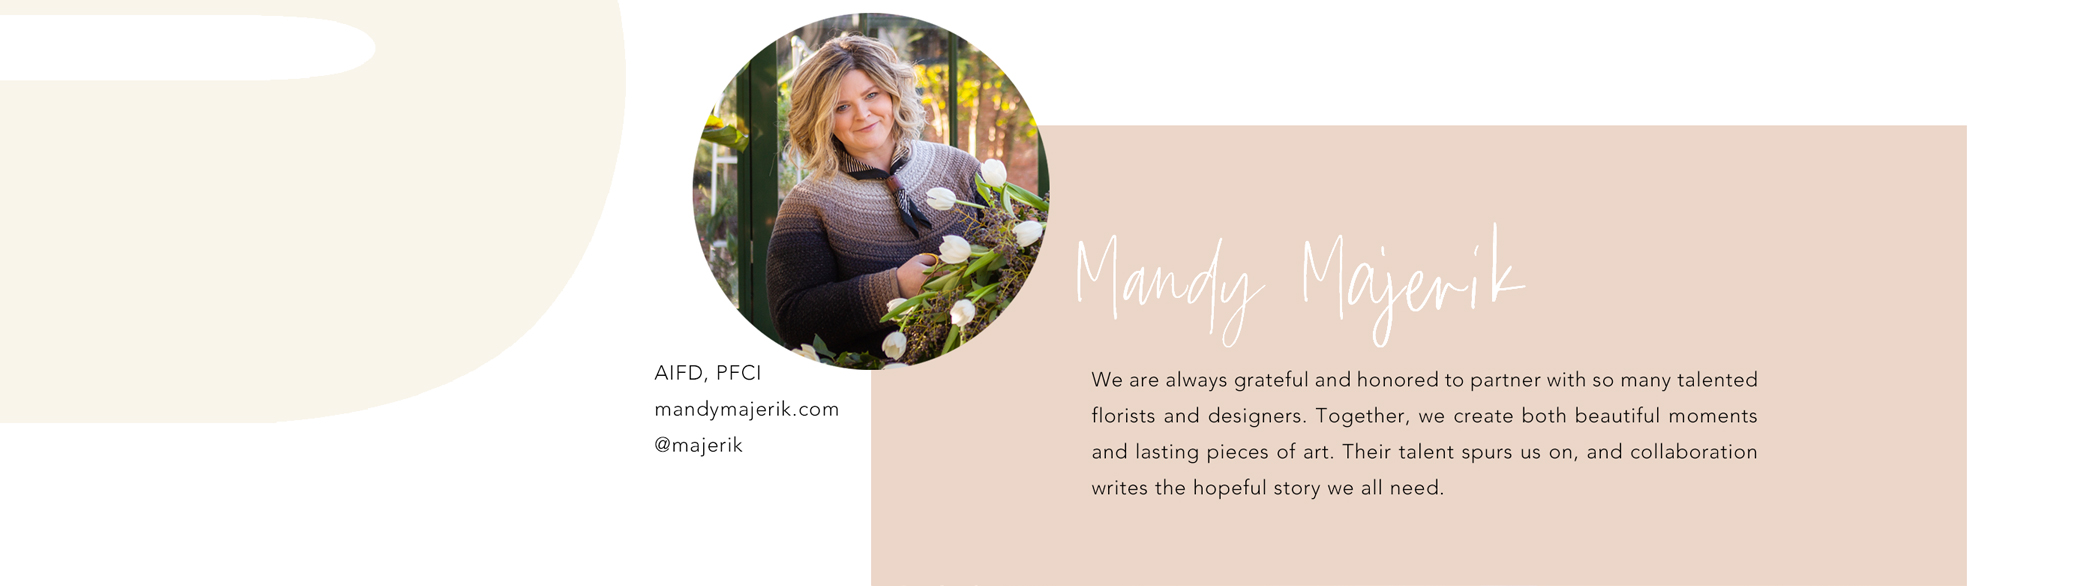 Mandy Majerik, AIFD PFC, mandymajerik.com